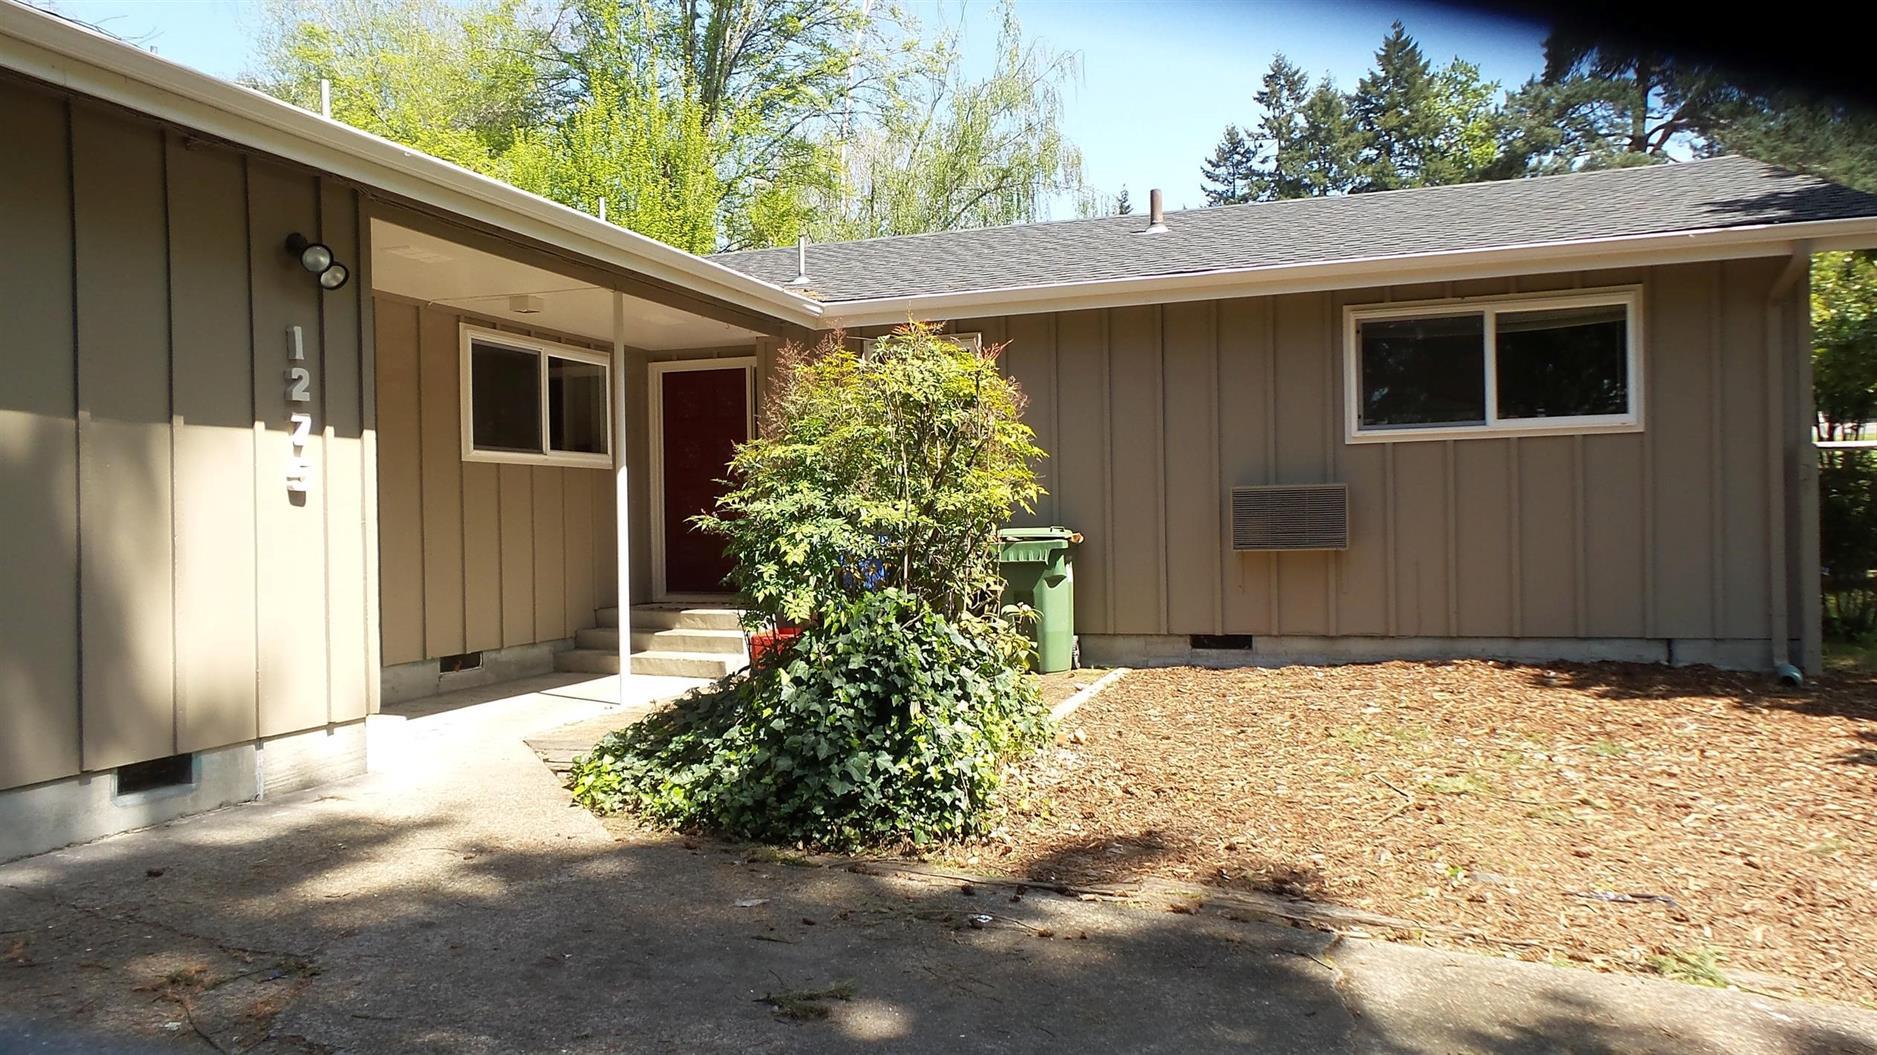 House for Rent in Eugene